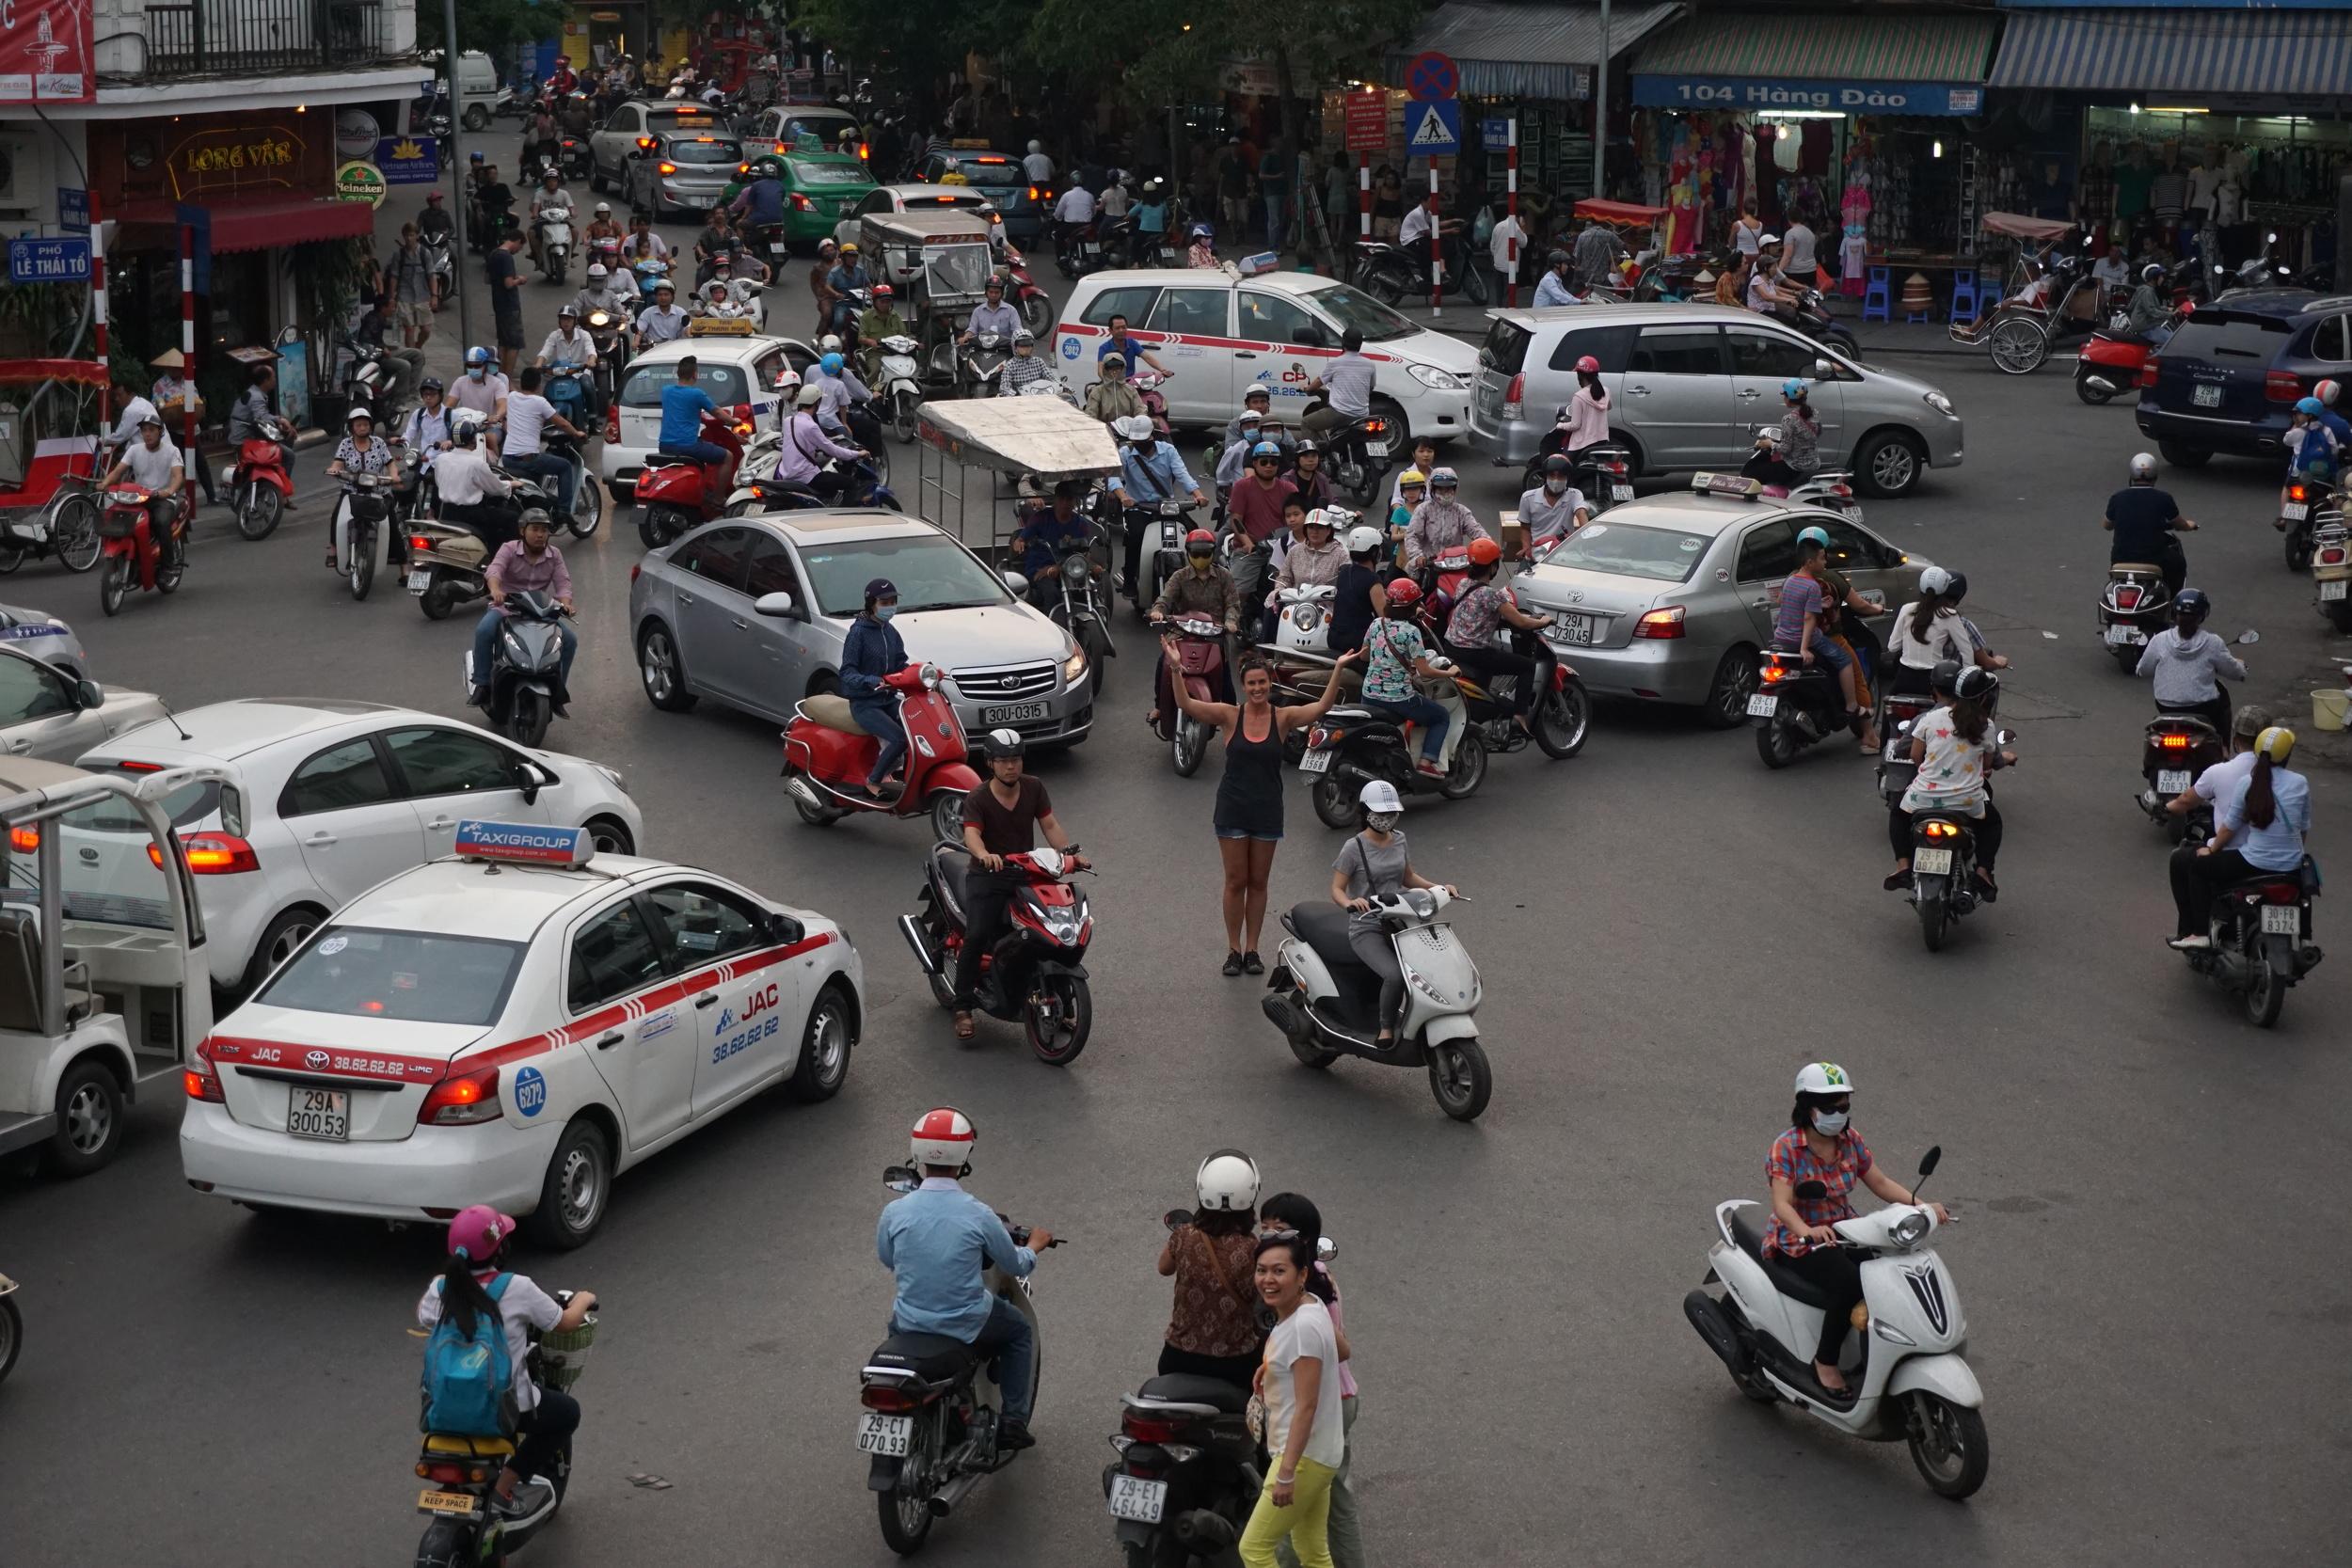 Hanoi traffic circle madness!